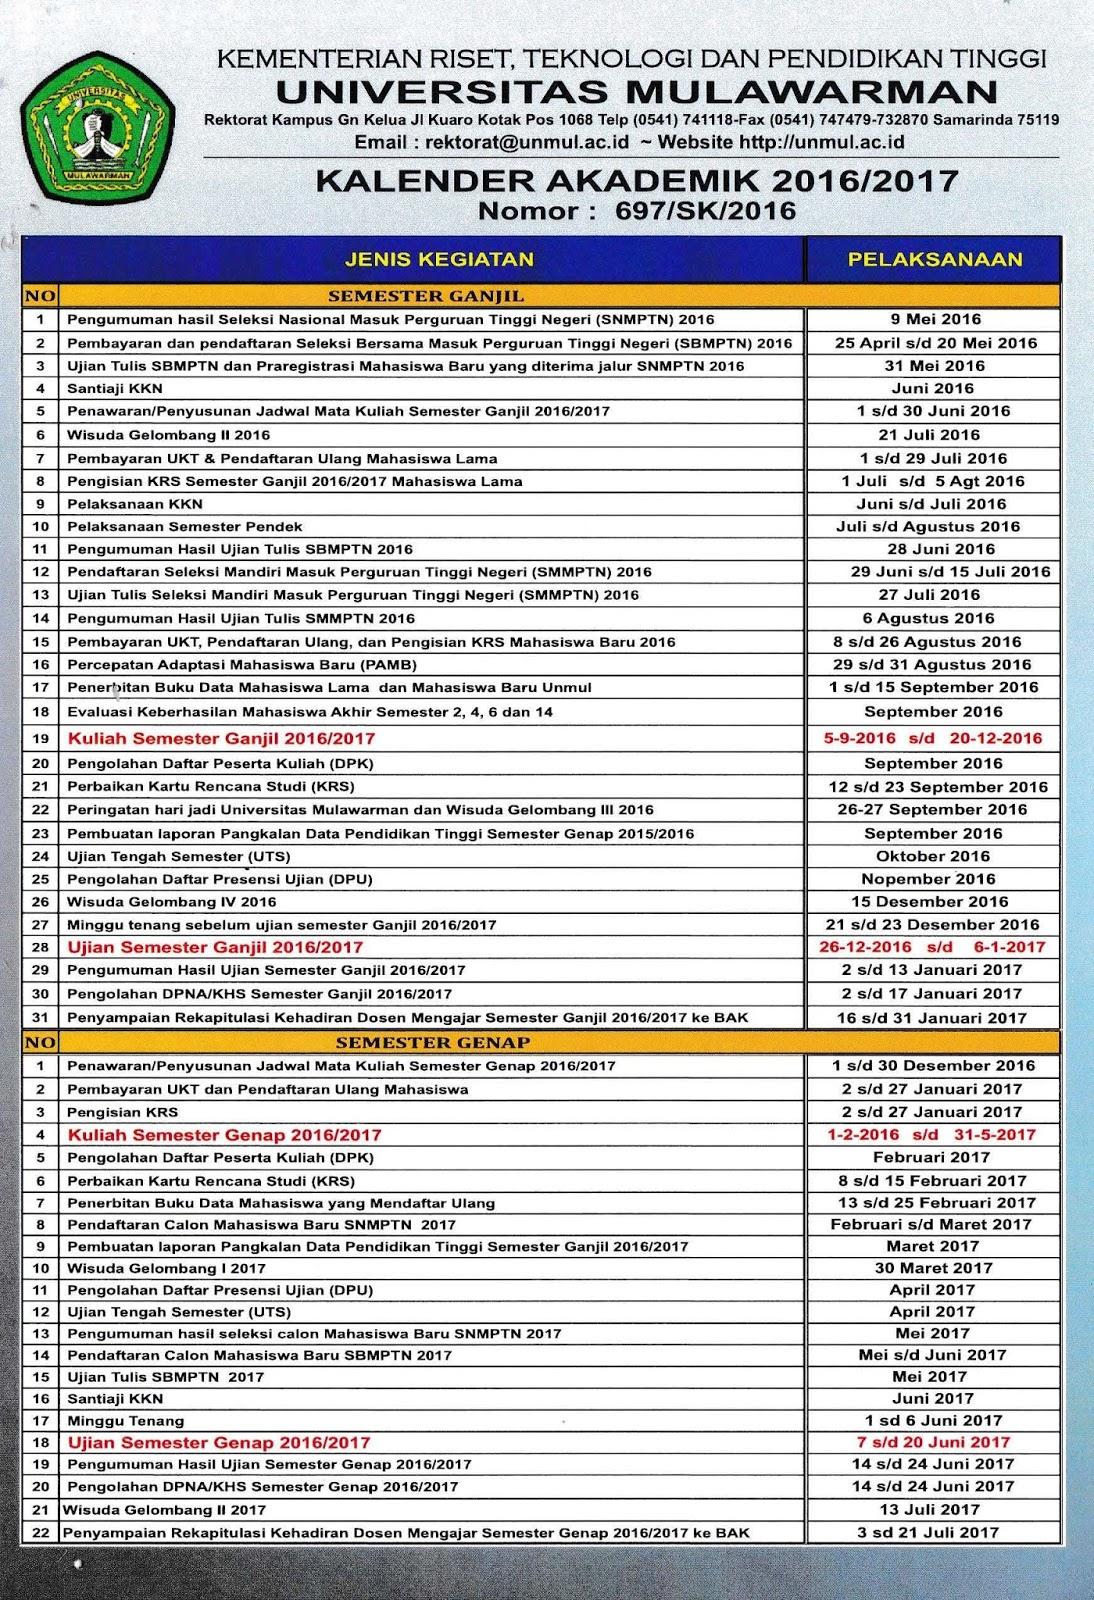 Kalender akademik2016-1